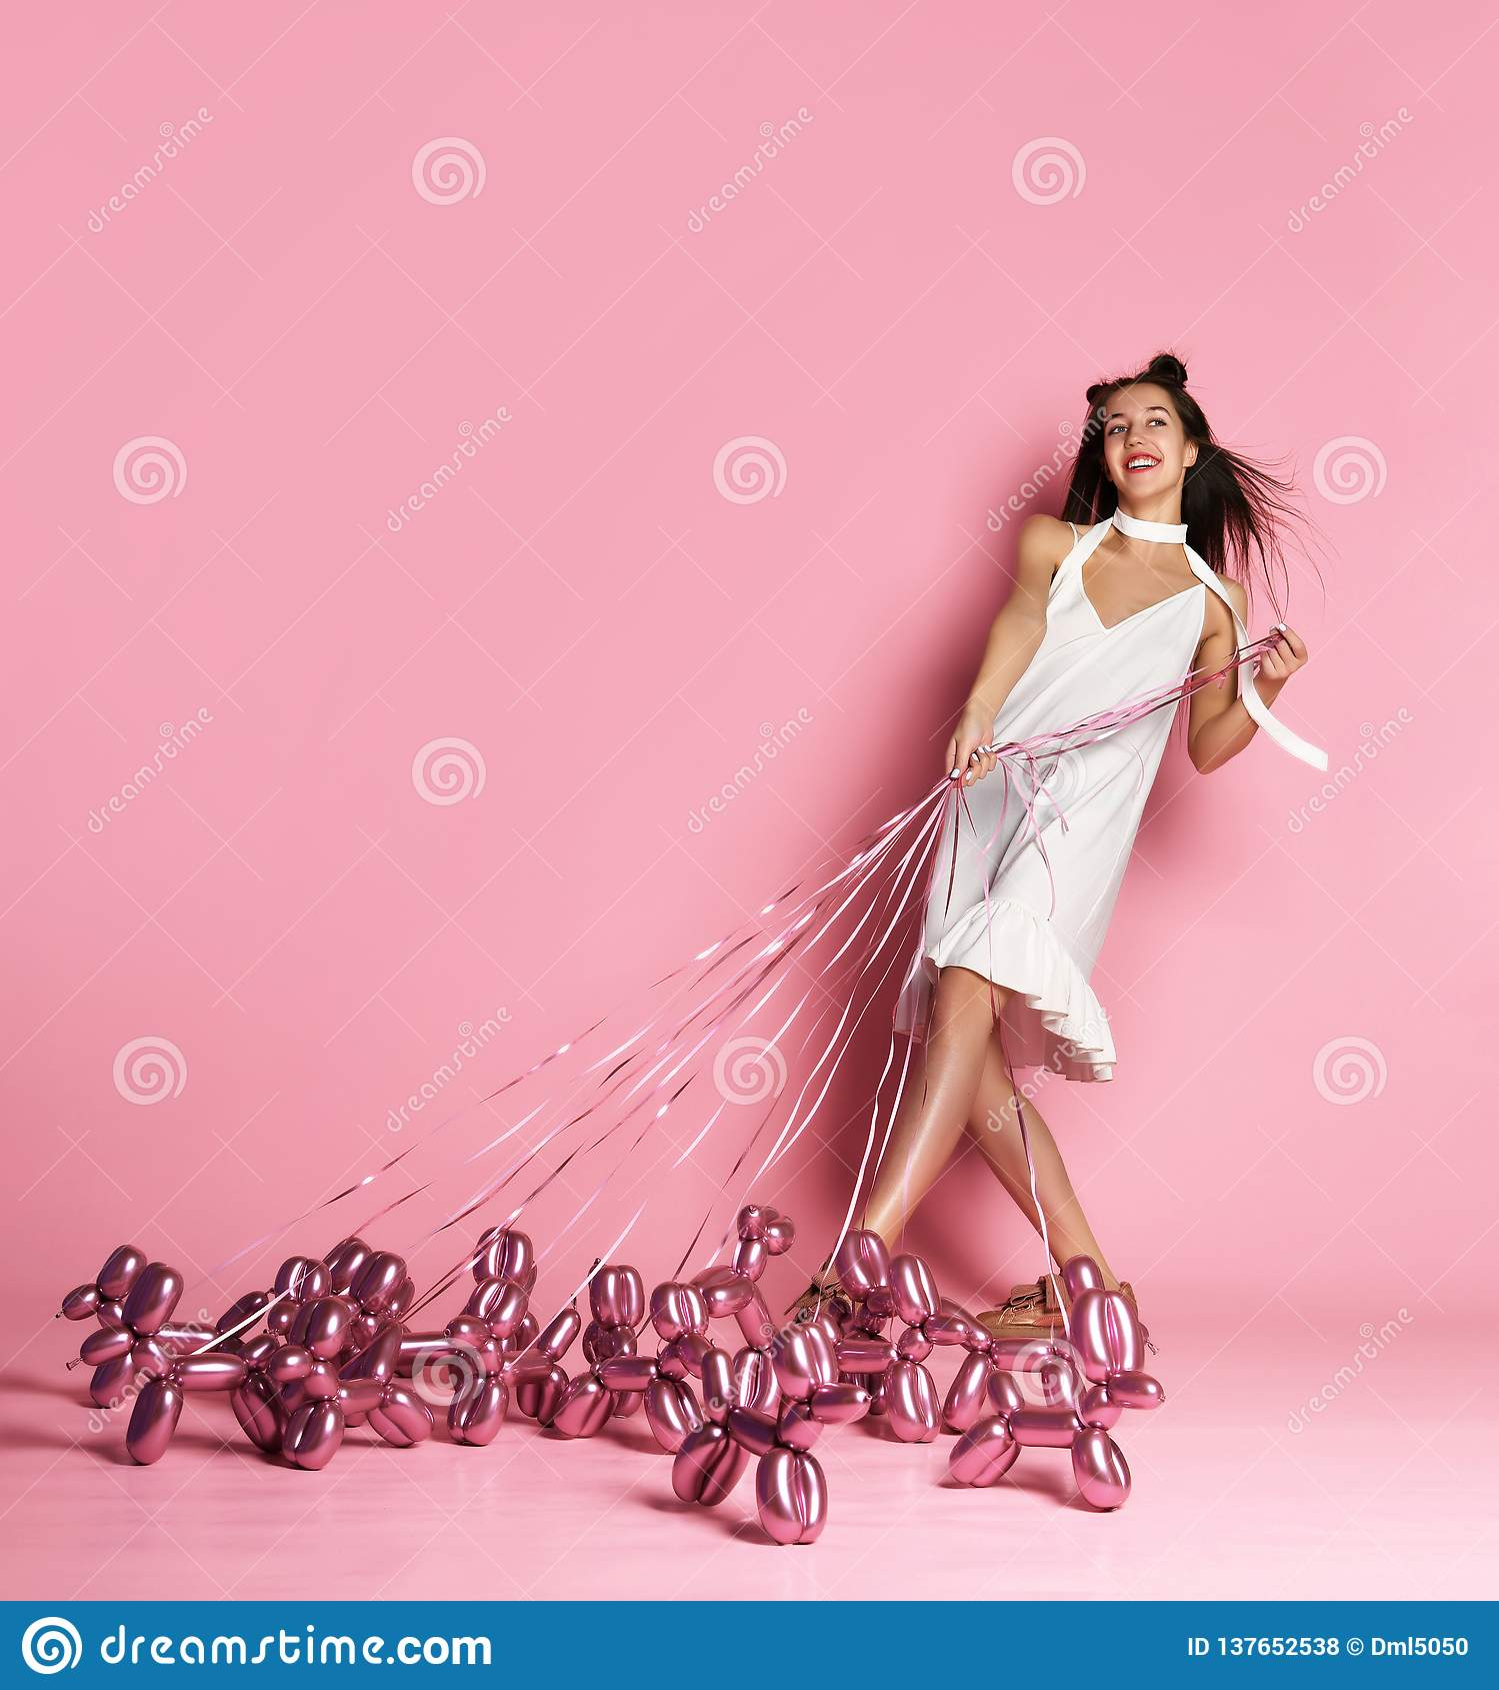 Het jonge mooie meisje in witte kleding loopt de opblaasbare ballonhonden op leiband het gelukkige glimlachen